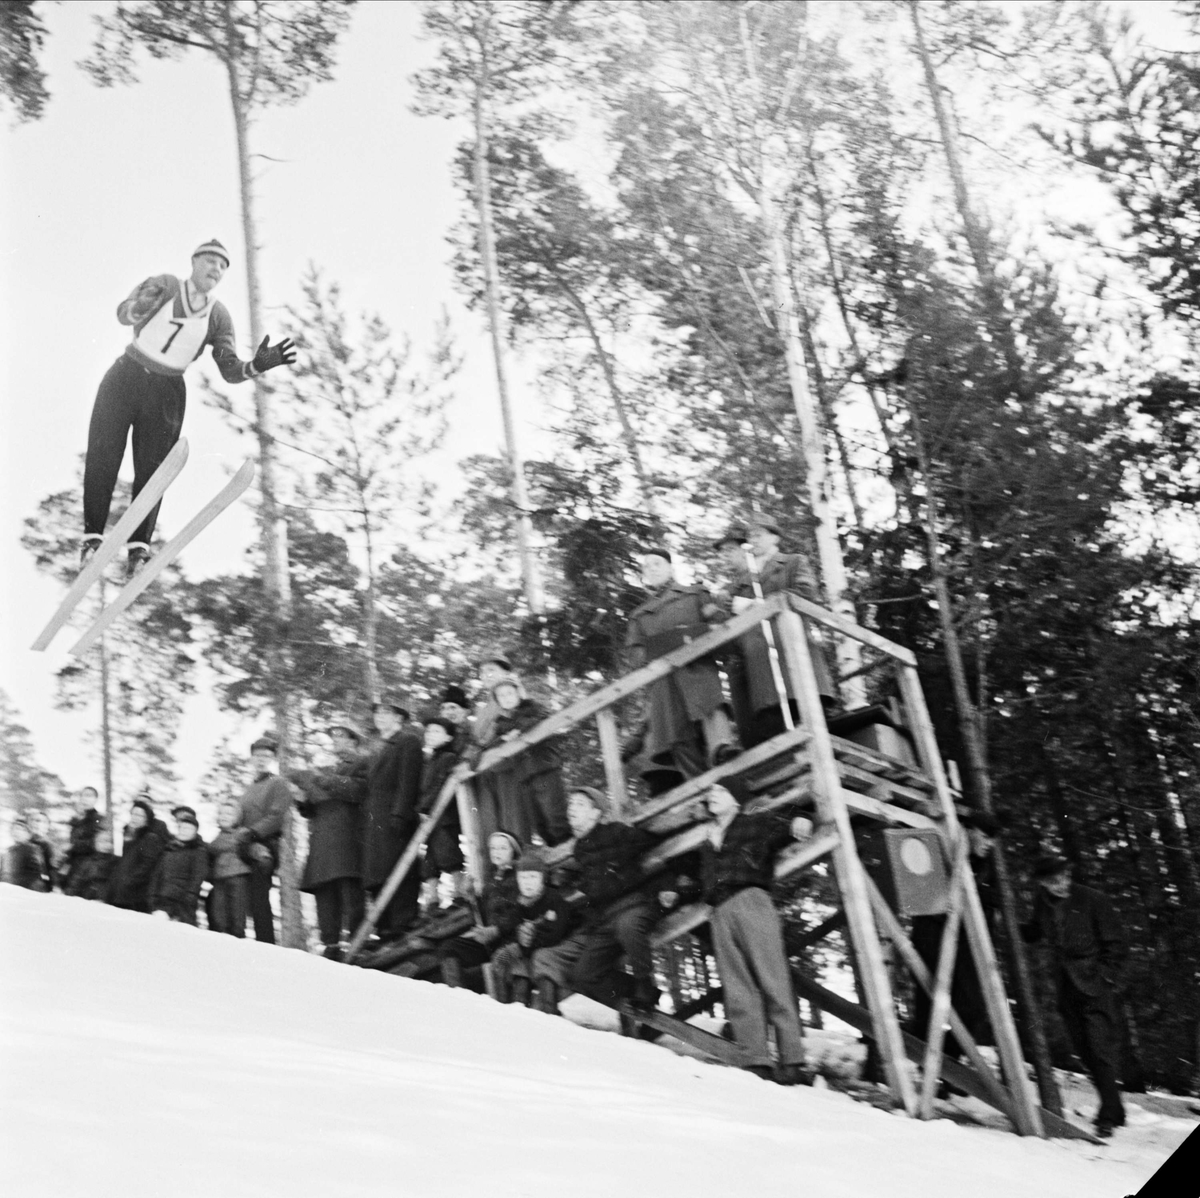 Backhoppning i Sunnerstabacken, Uppsala mars 1954